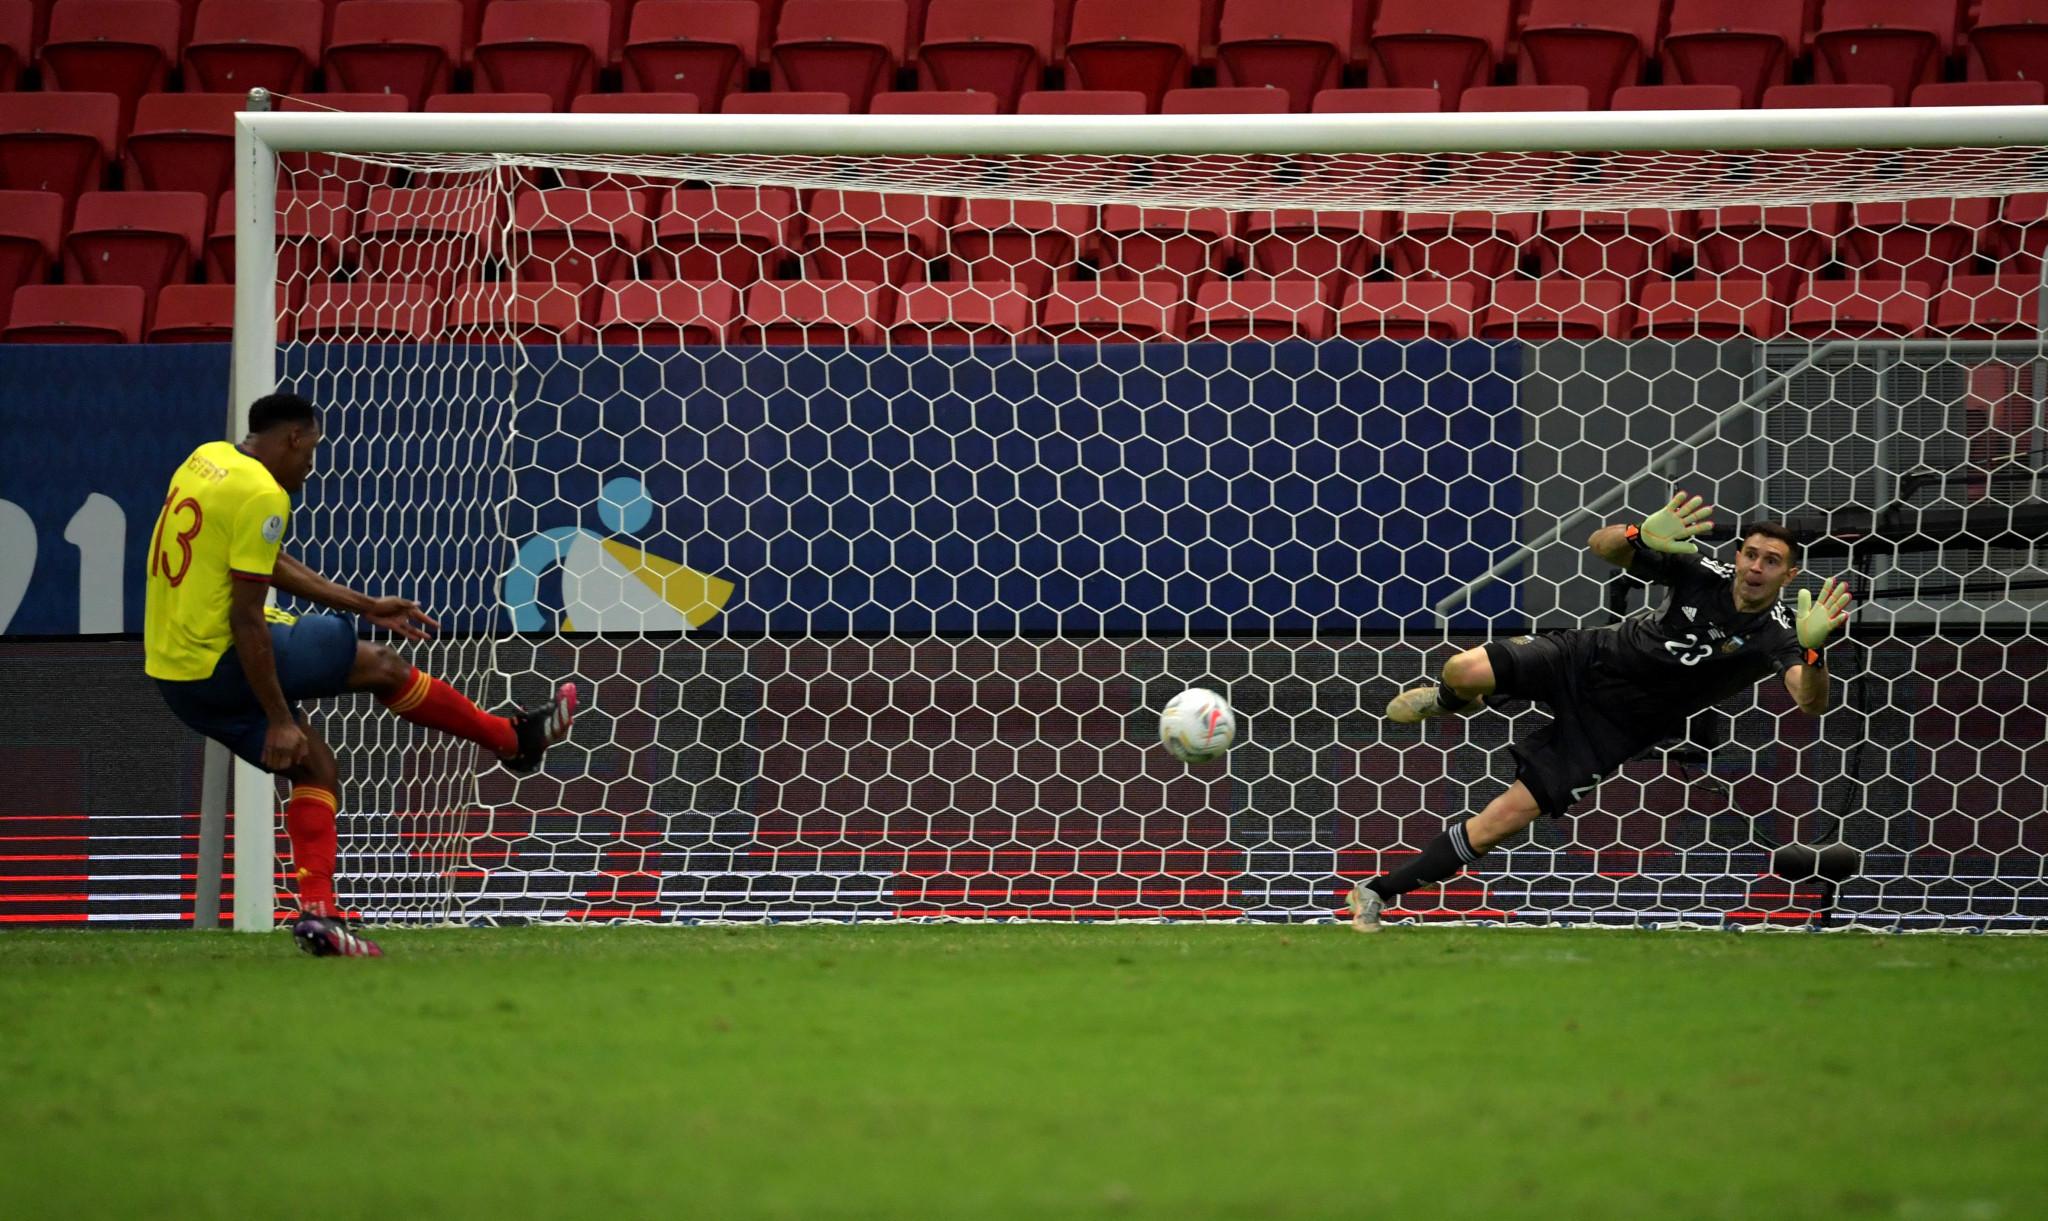 Martinez saves three penalties to send Argentina to Copa América final